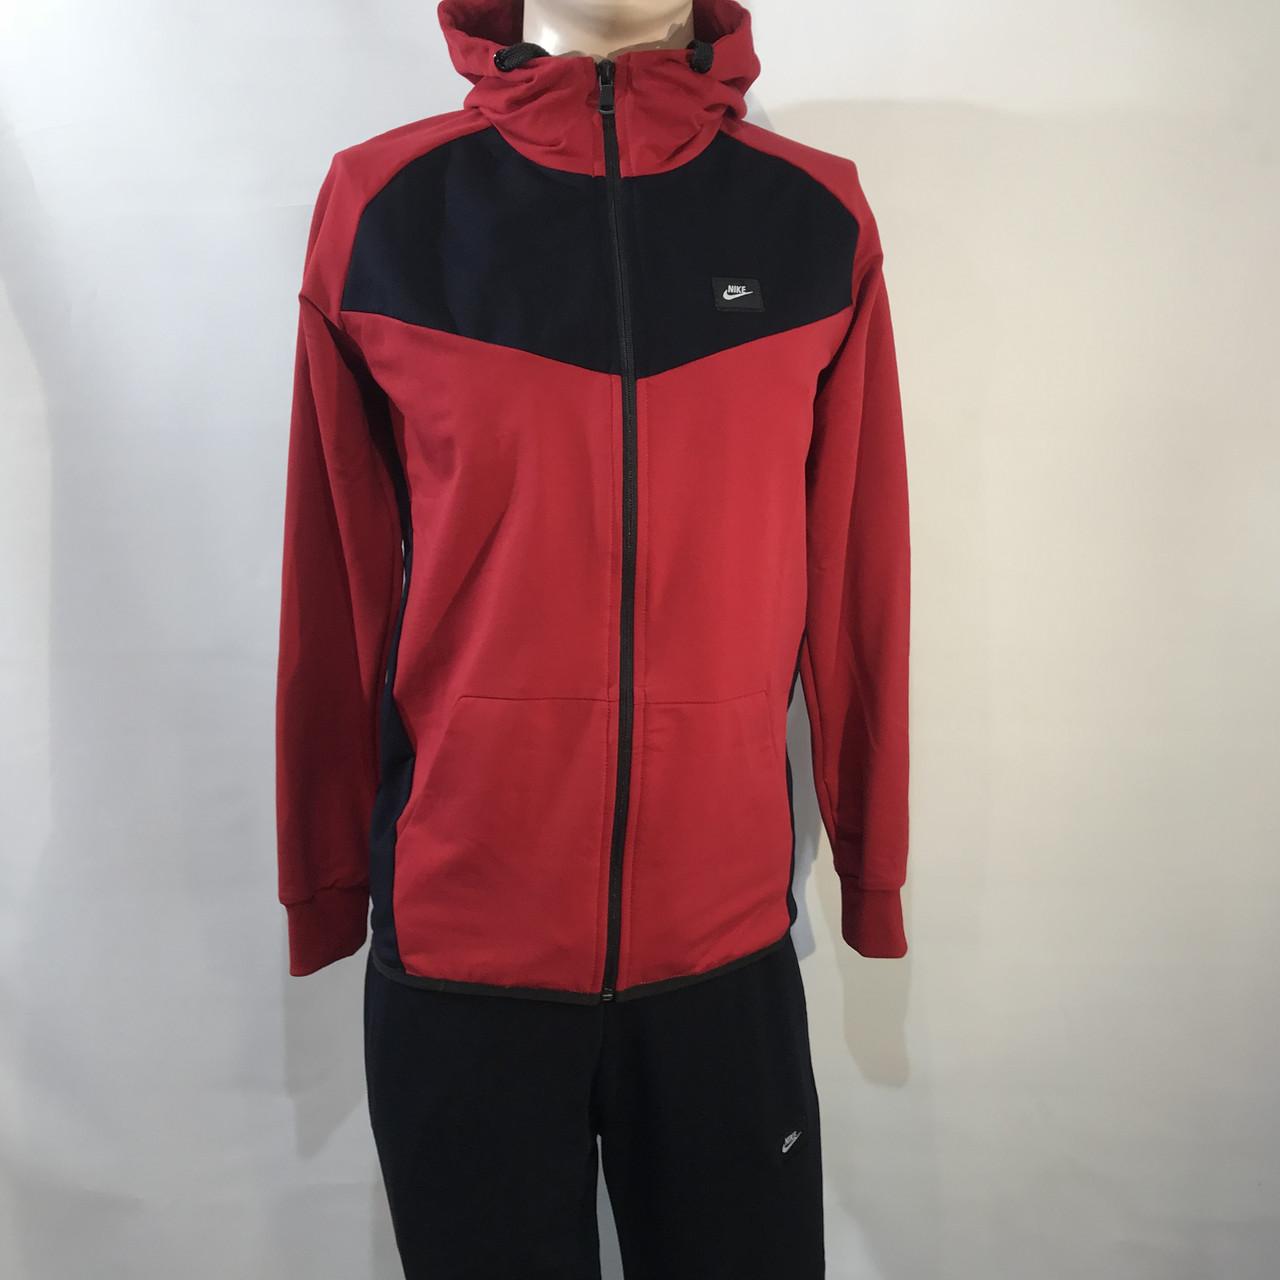 Мужской спортивный костюм Nike / трикотажный